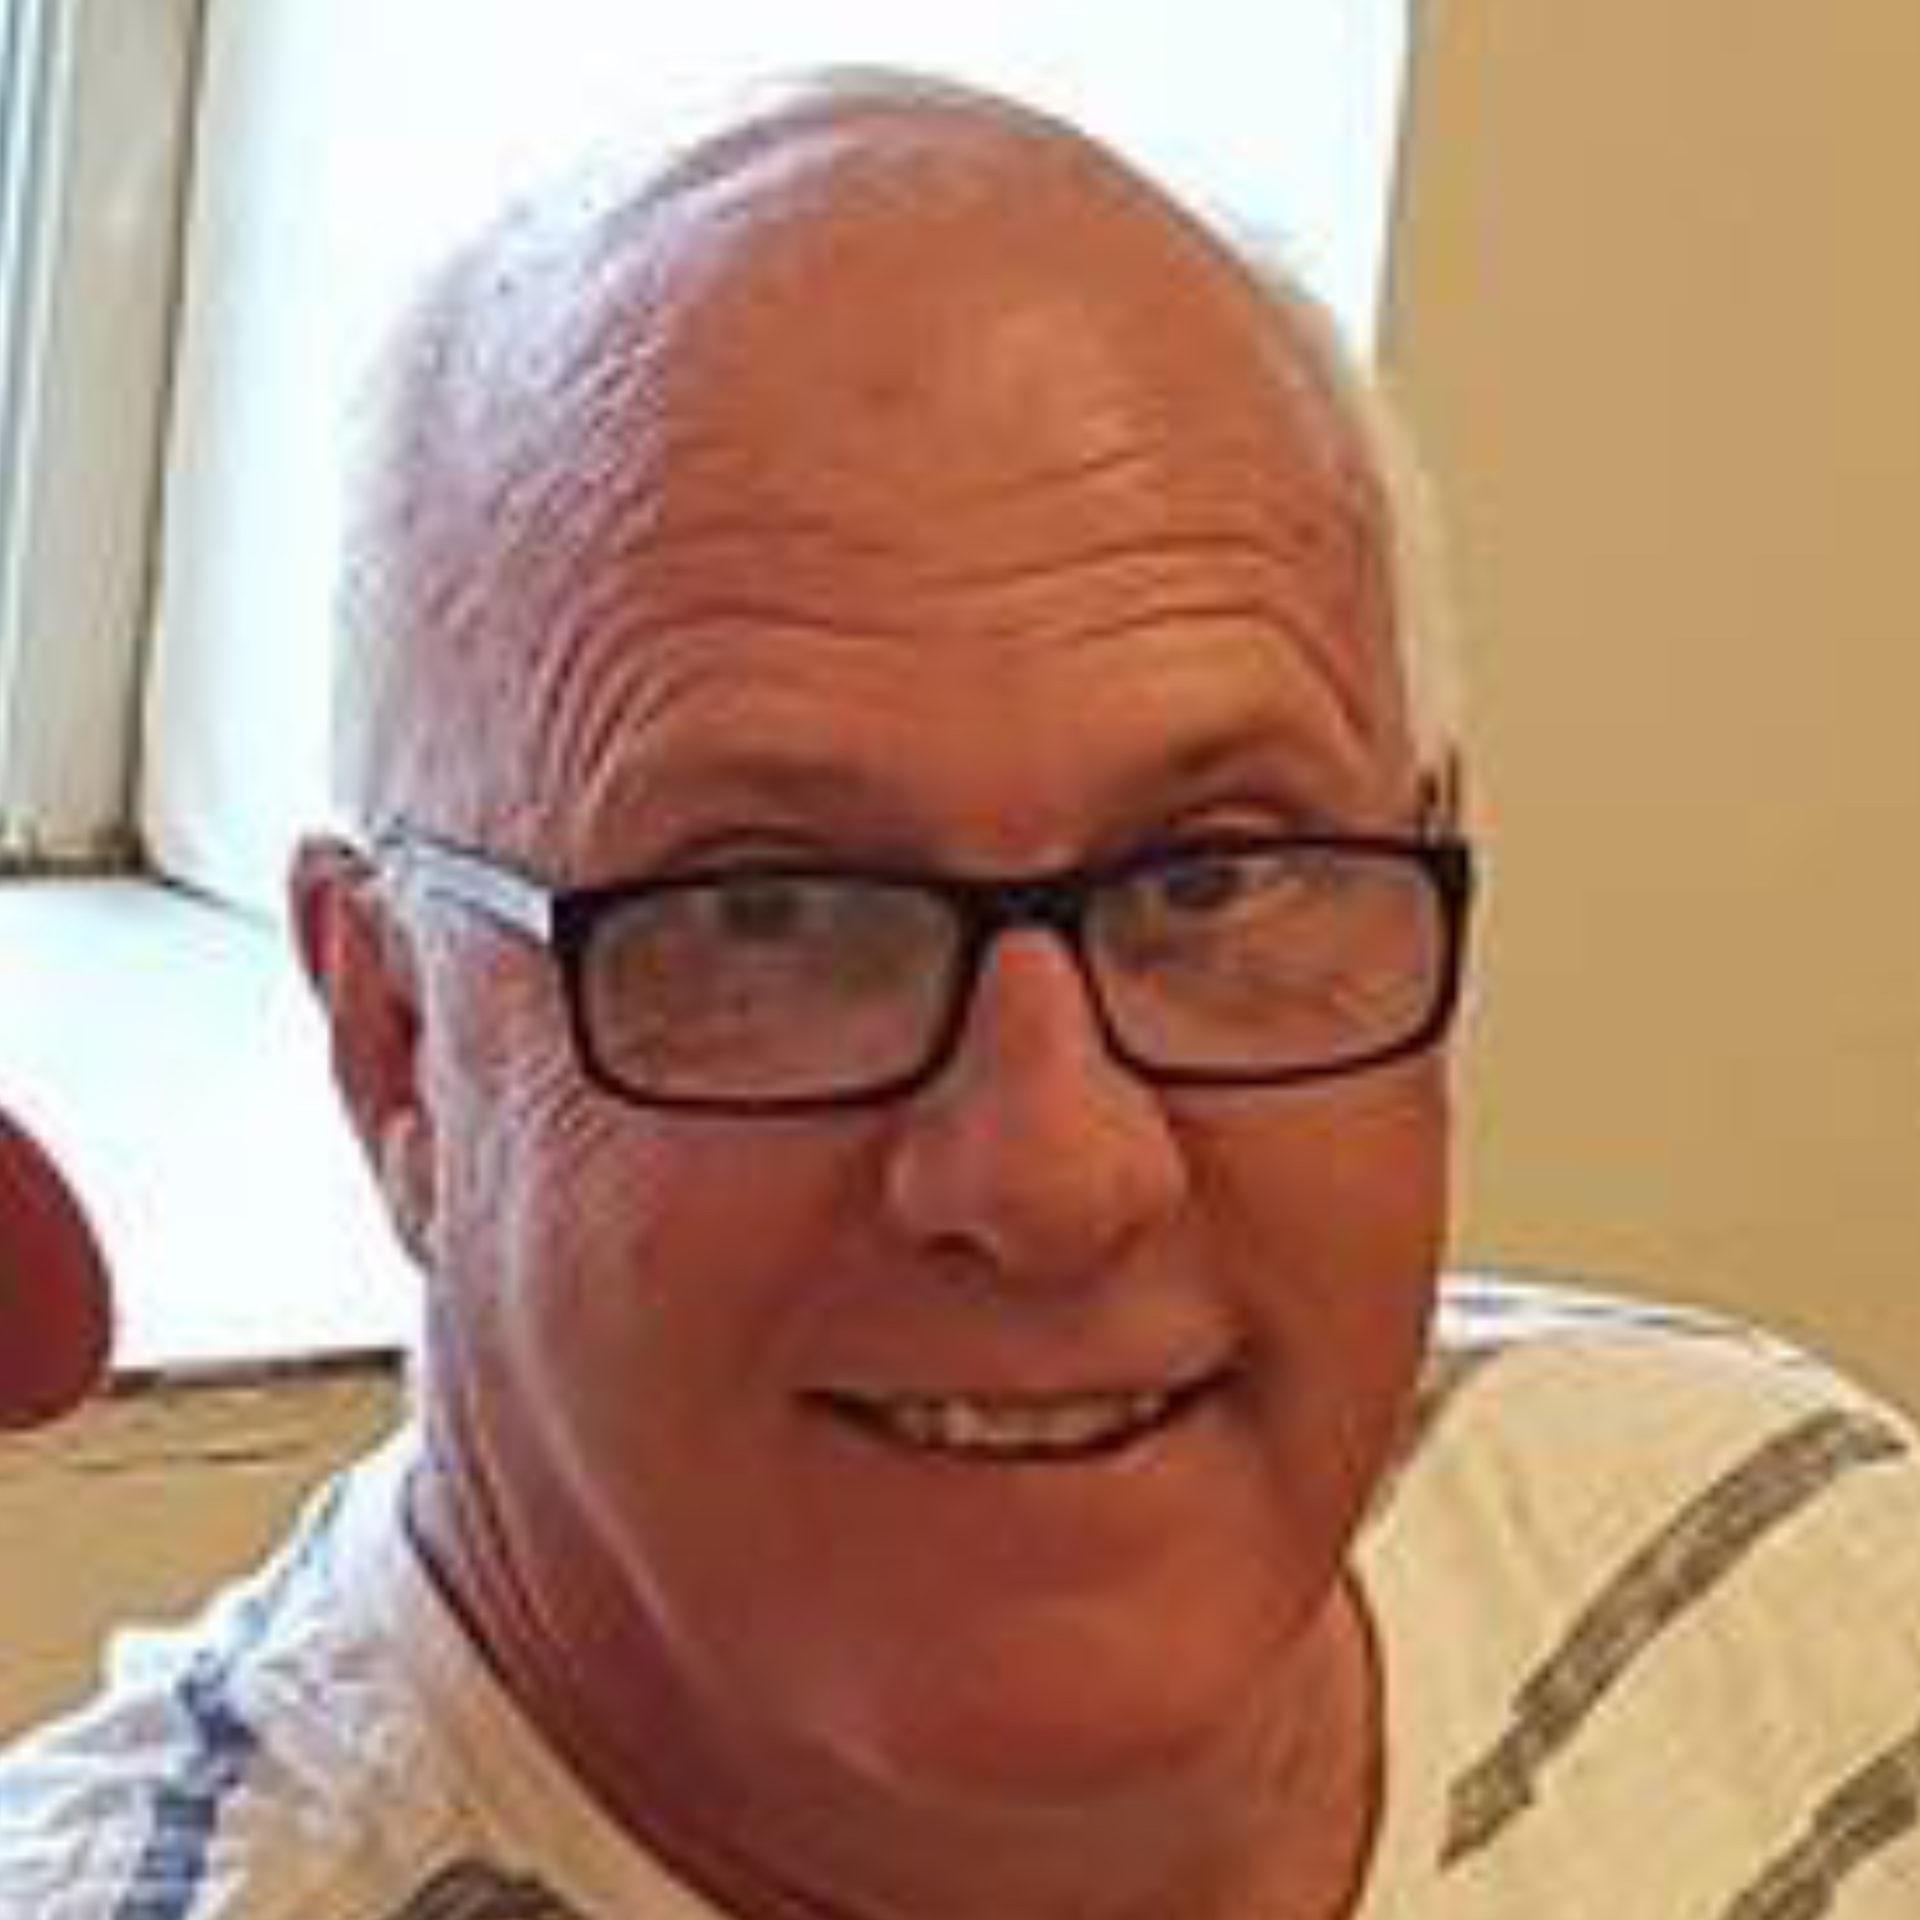 Kevin Henning